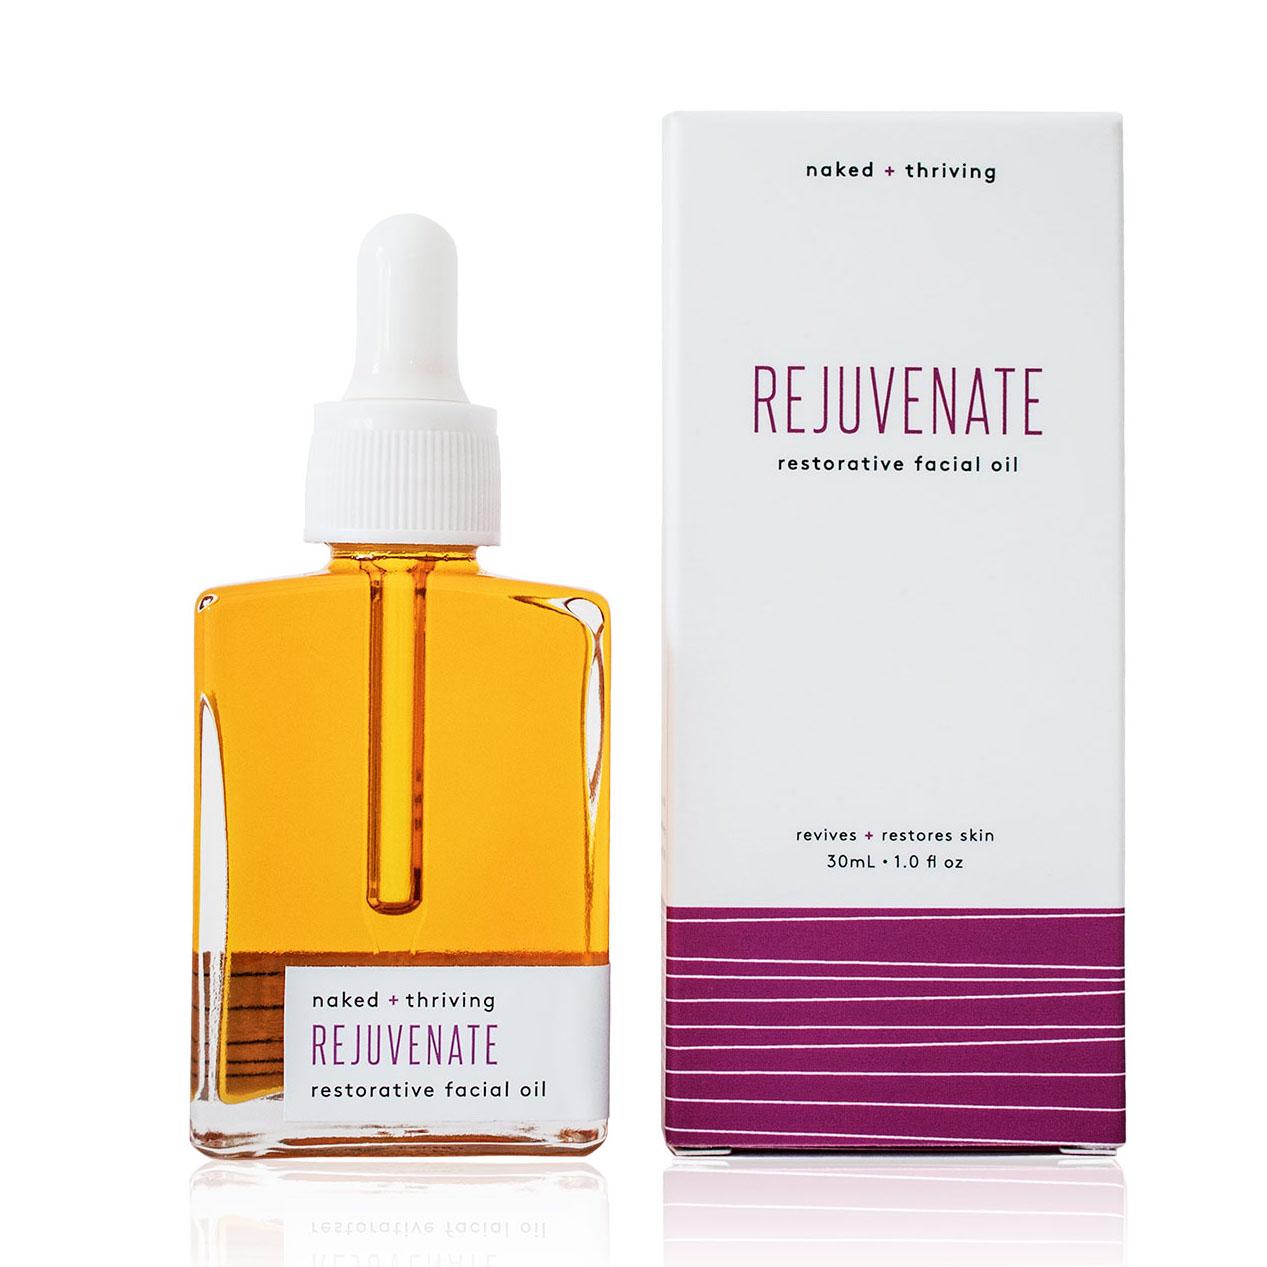 rejuvenate restorative facial oil